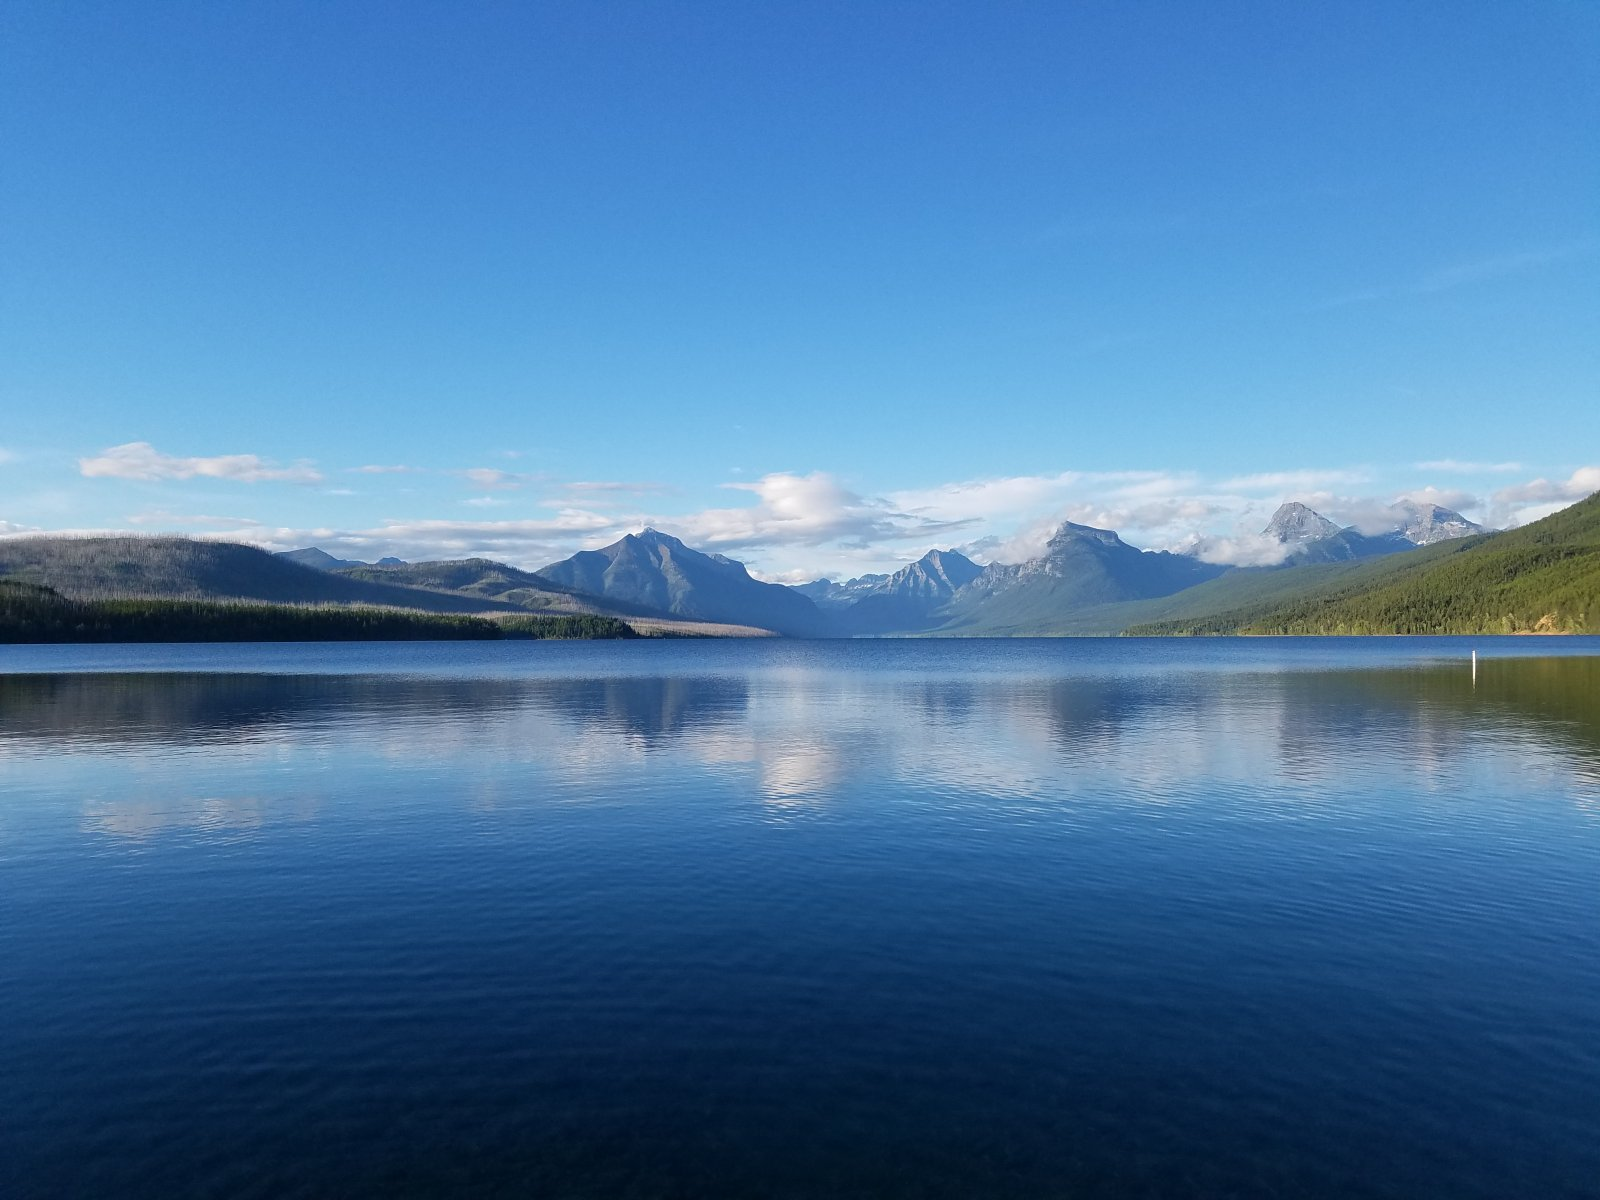 Click image for larger version  Name:Lake McDonald West Glacier.jpg Views:57 Size:200.0 KB ID:268634